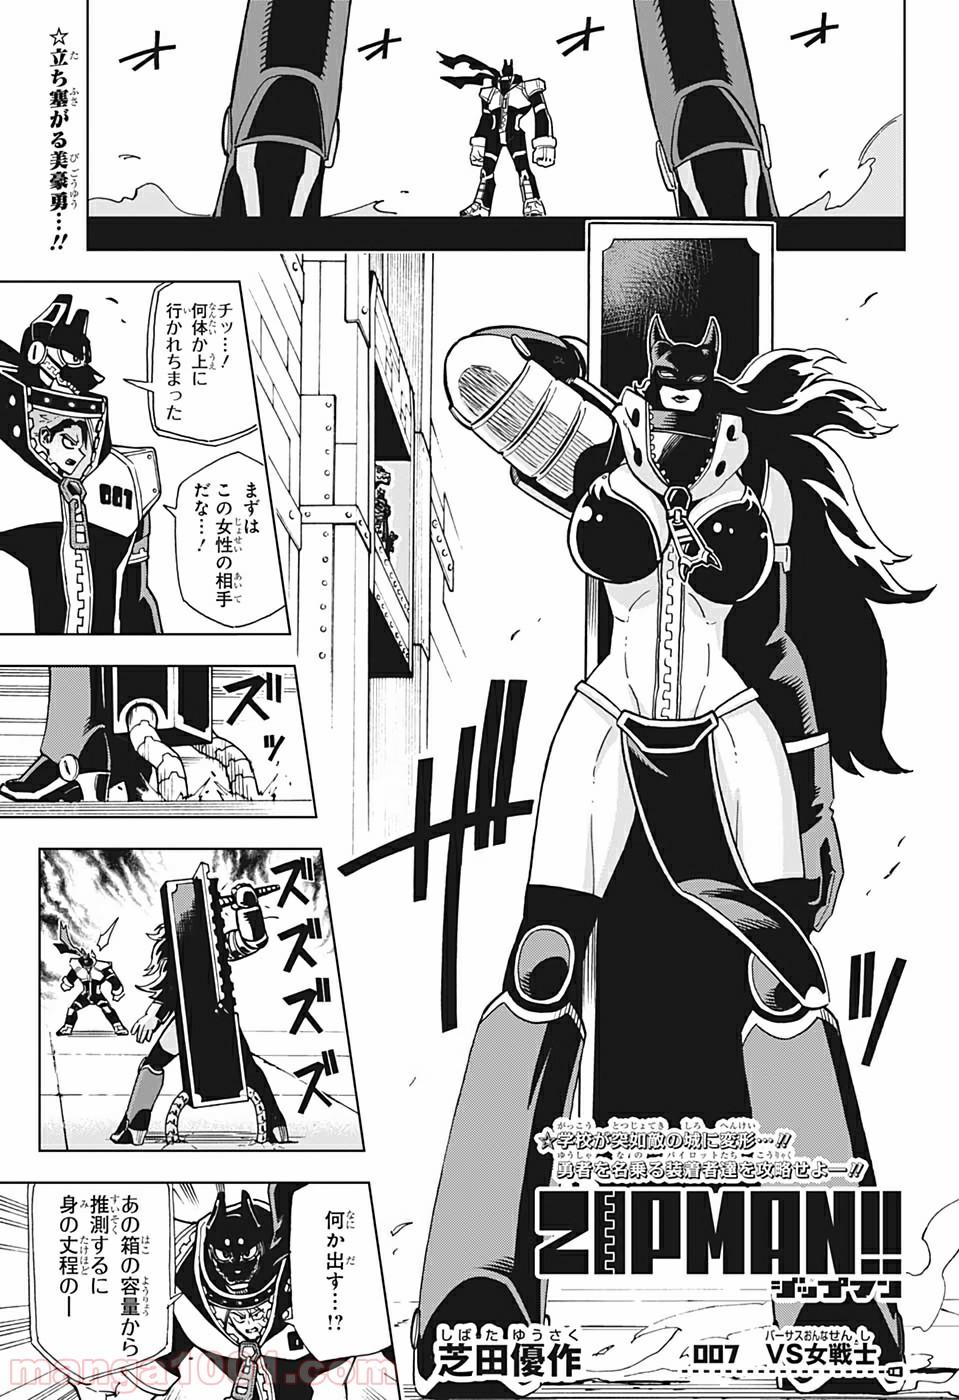 ZIPMAN!! - Raw 【第7話】 - Manga1001.com